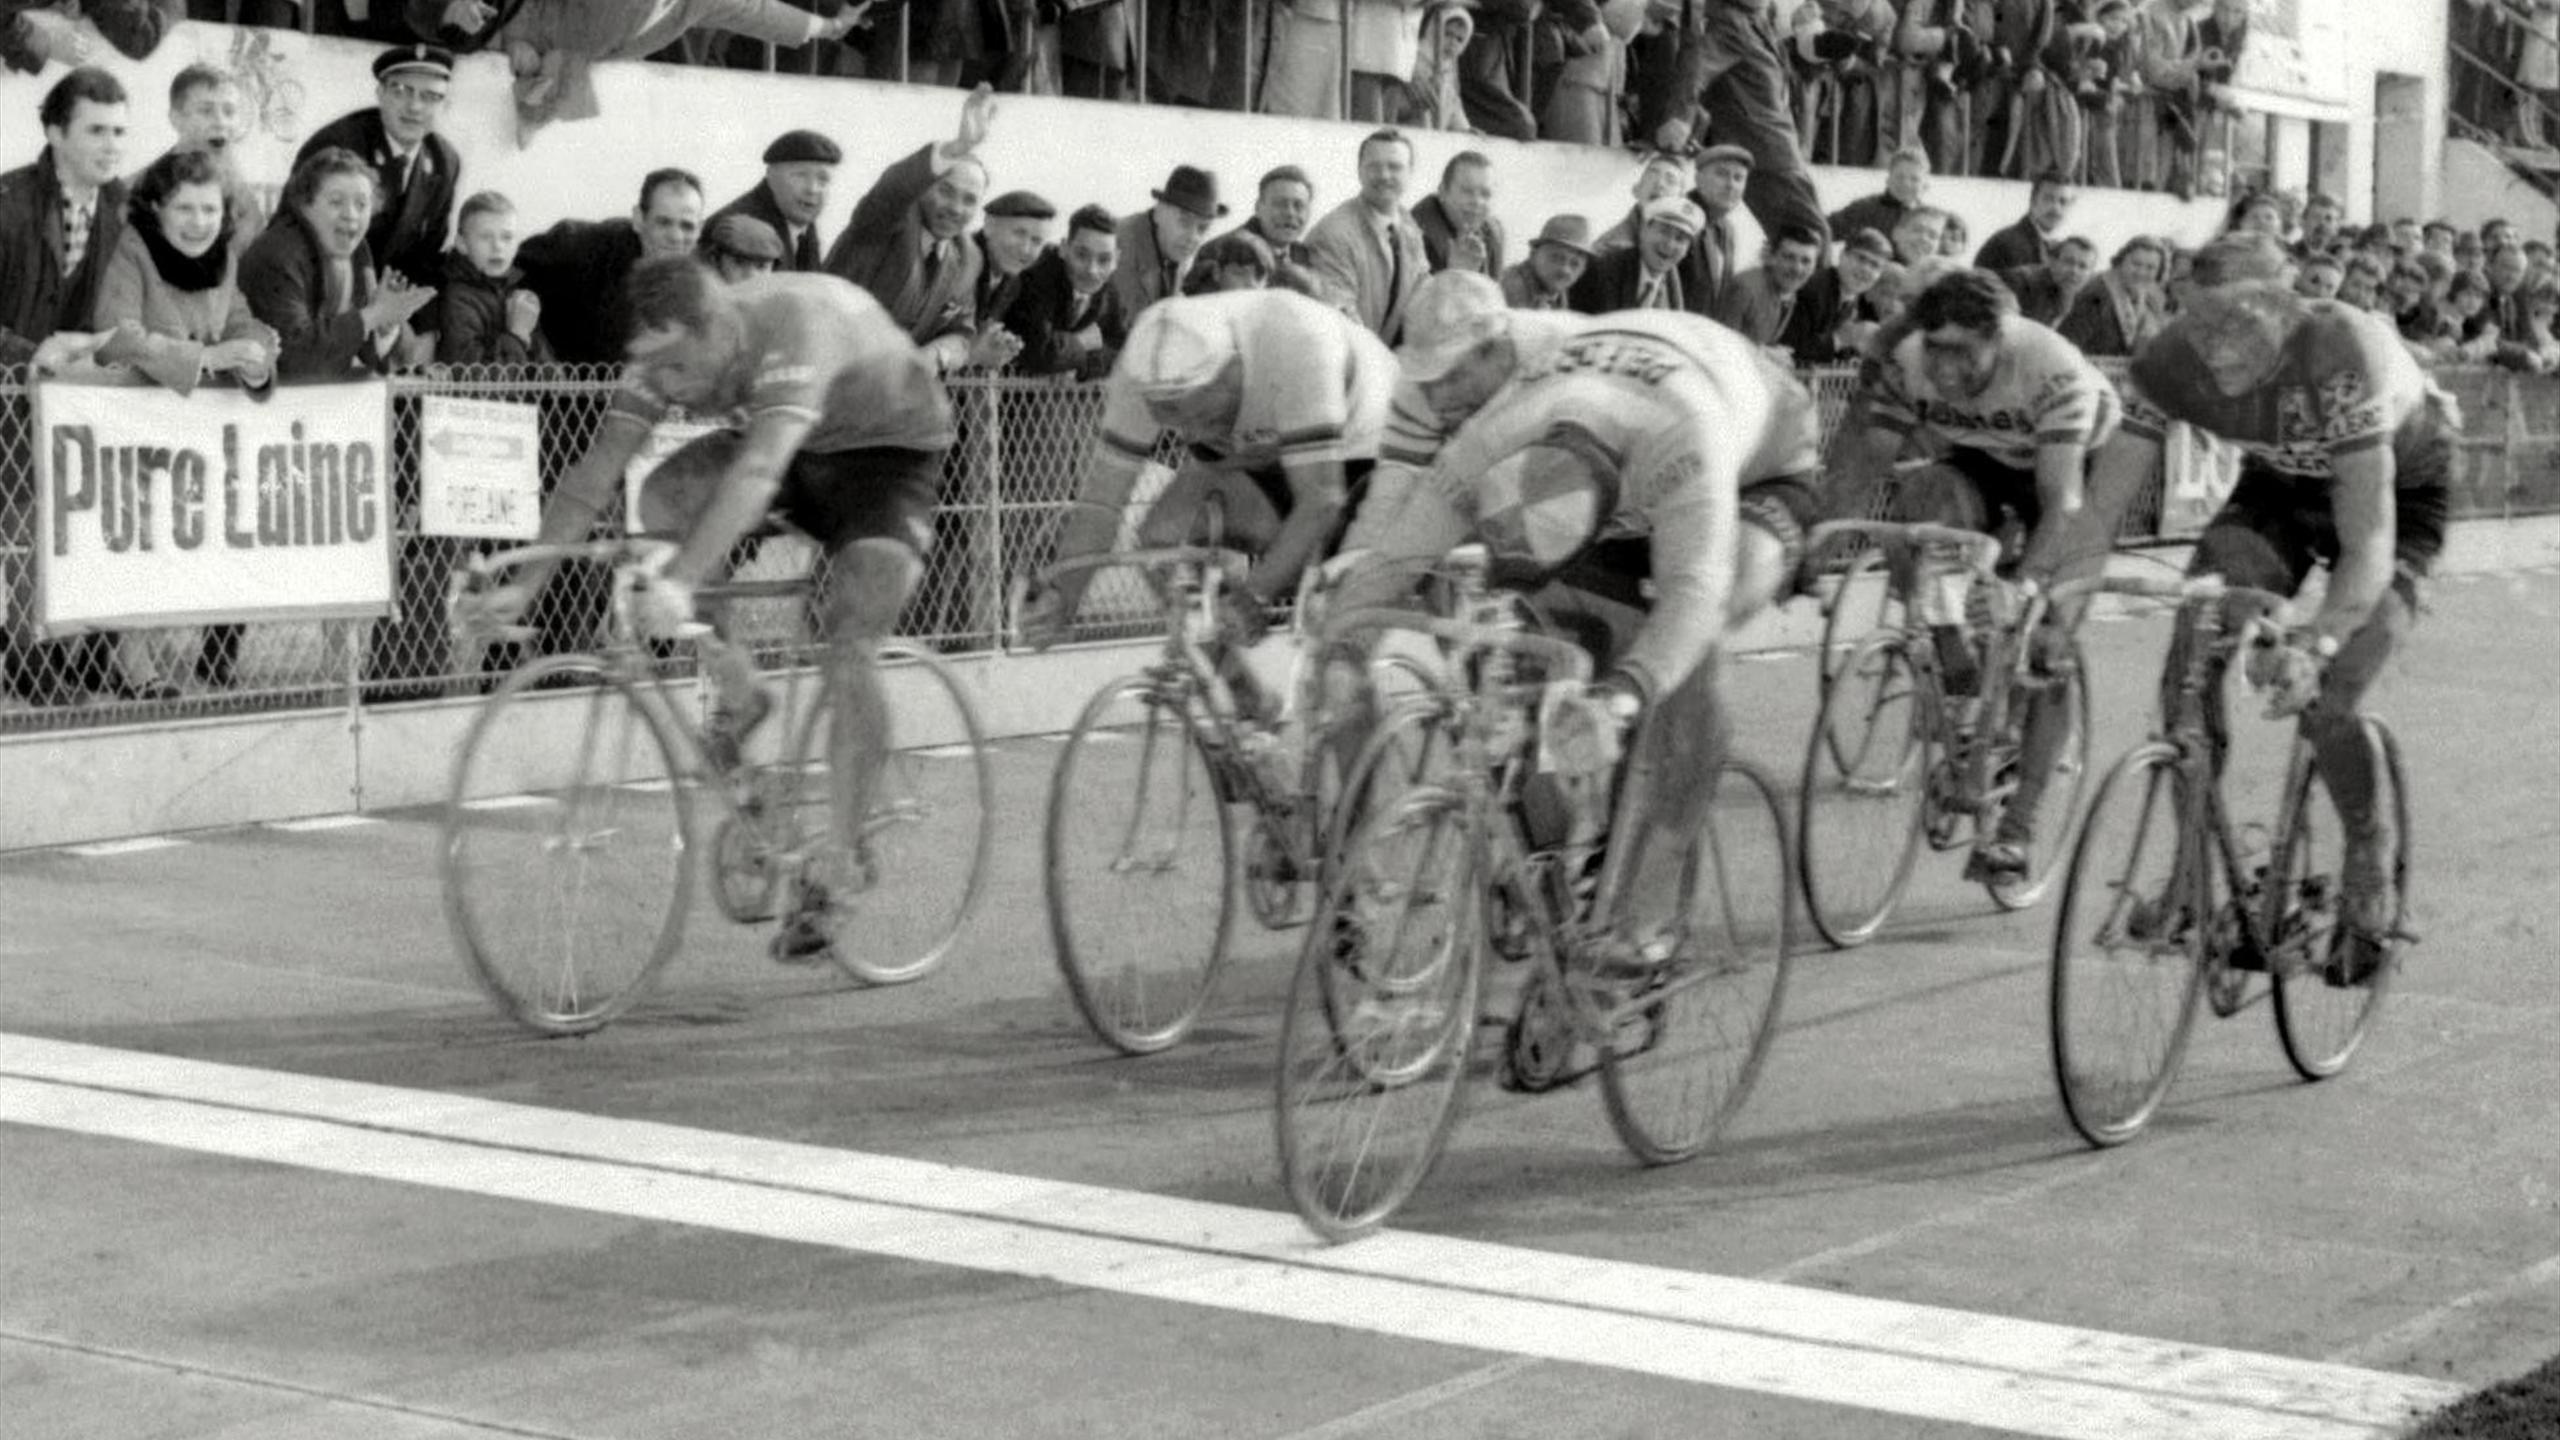 Eddy Merckx nest jamais allé à Vérone (French Edition)